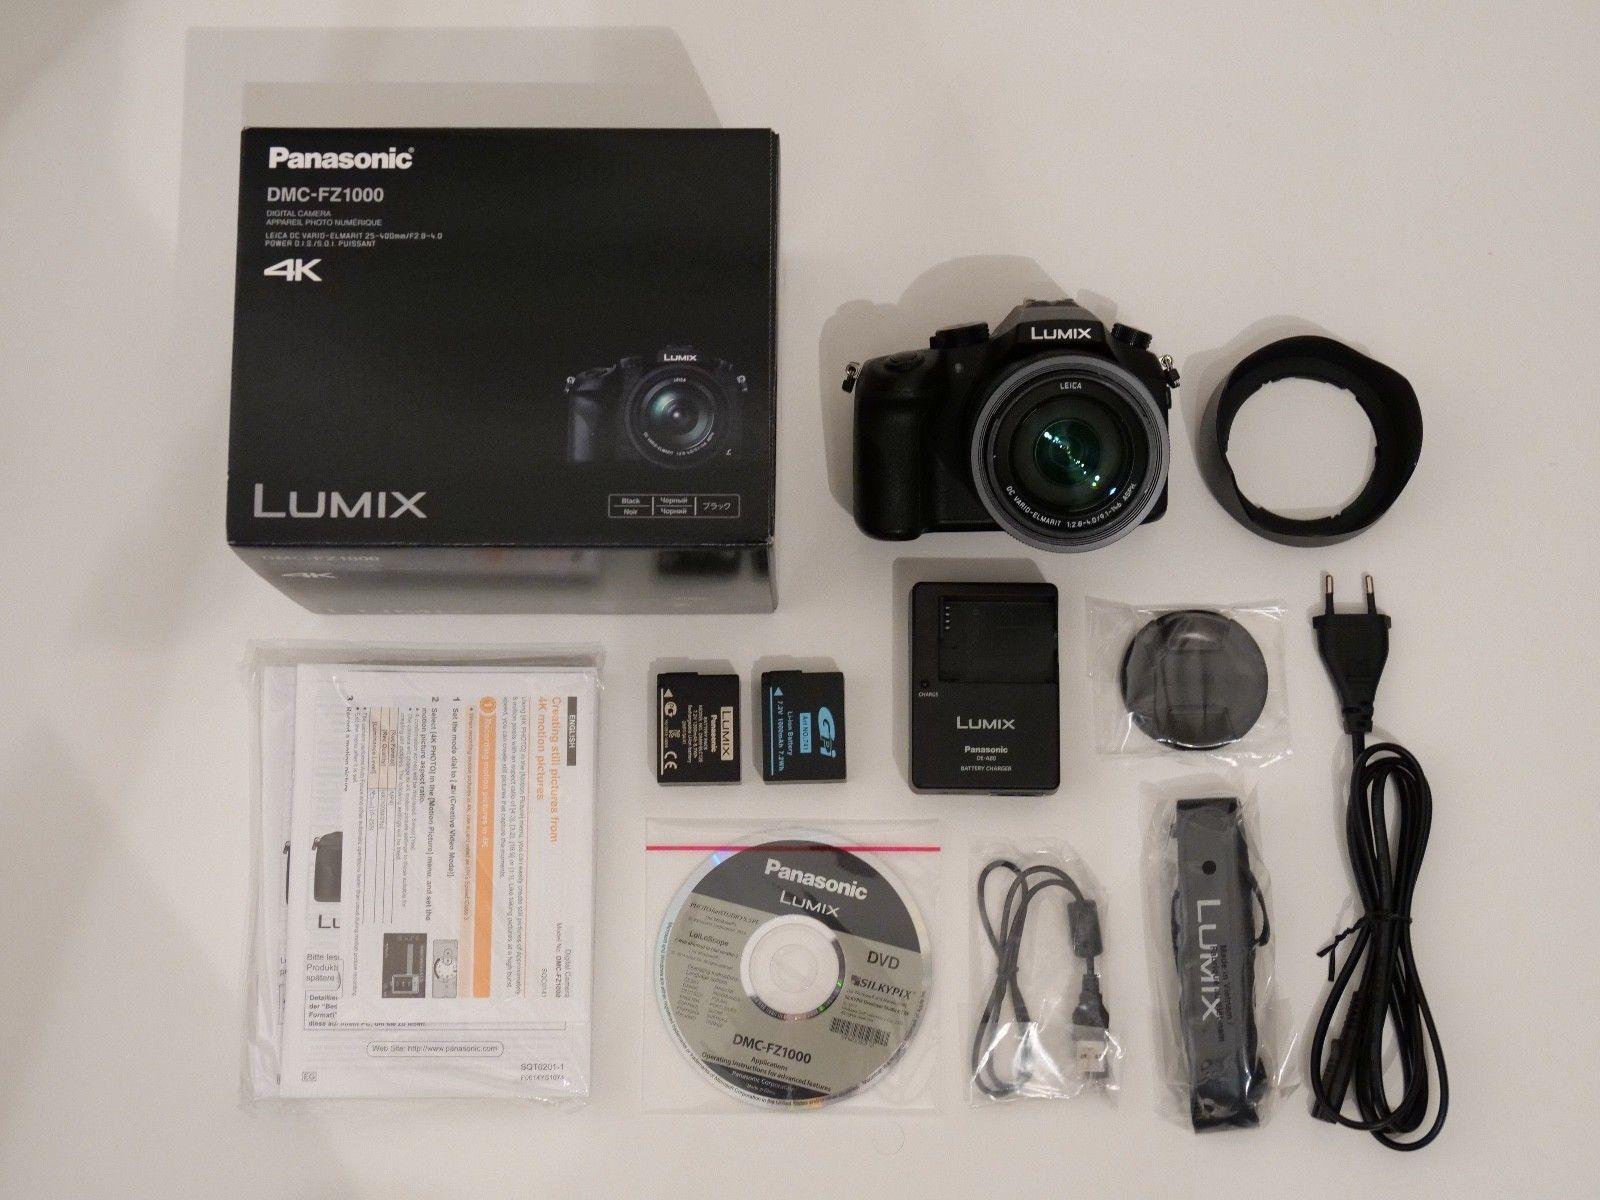 Panasonic LUMIX DMC-FZ1000, 20.1 MP, Top-Zustand, noch 21 Monate Garantie!